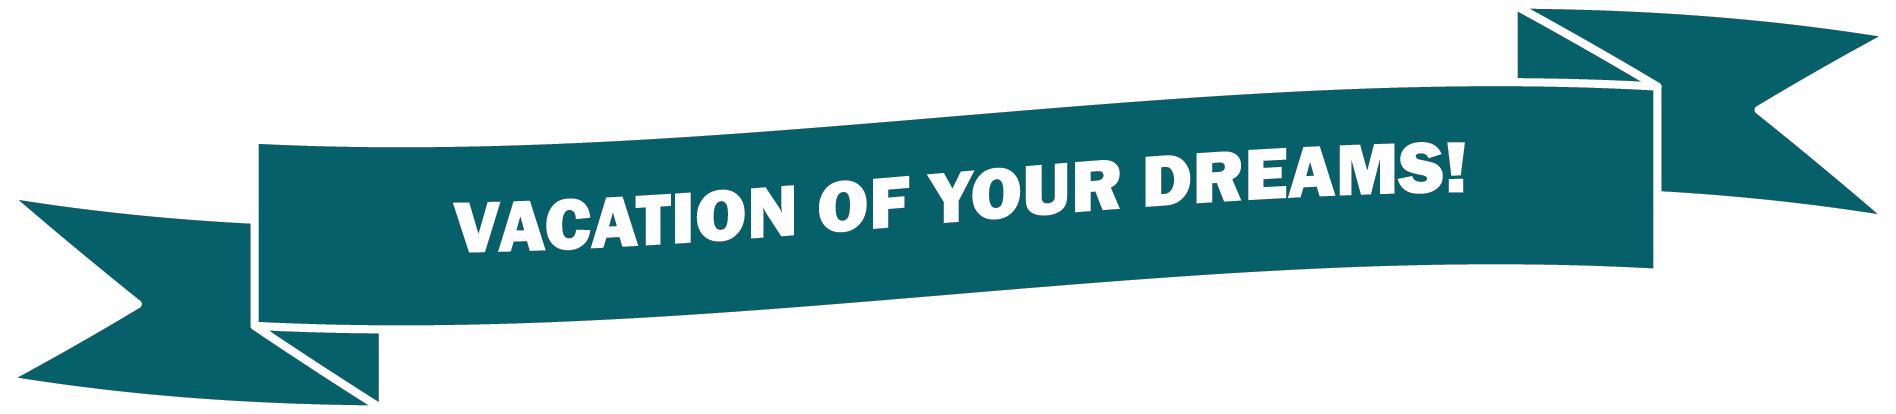 Raffle flyer vacation banner